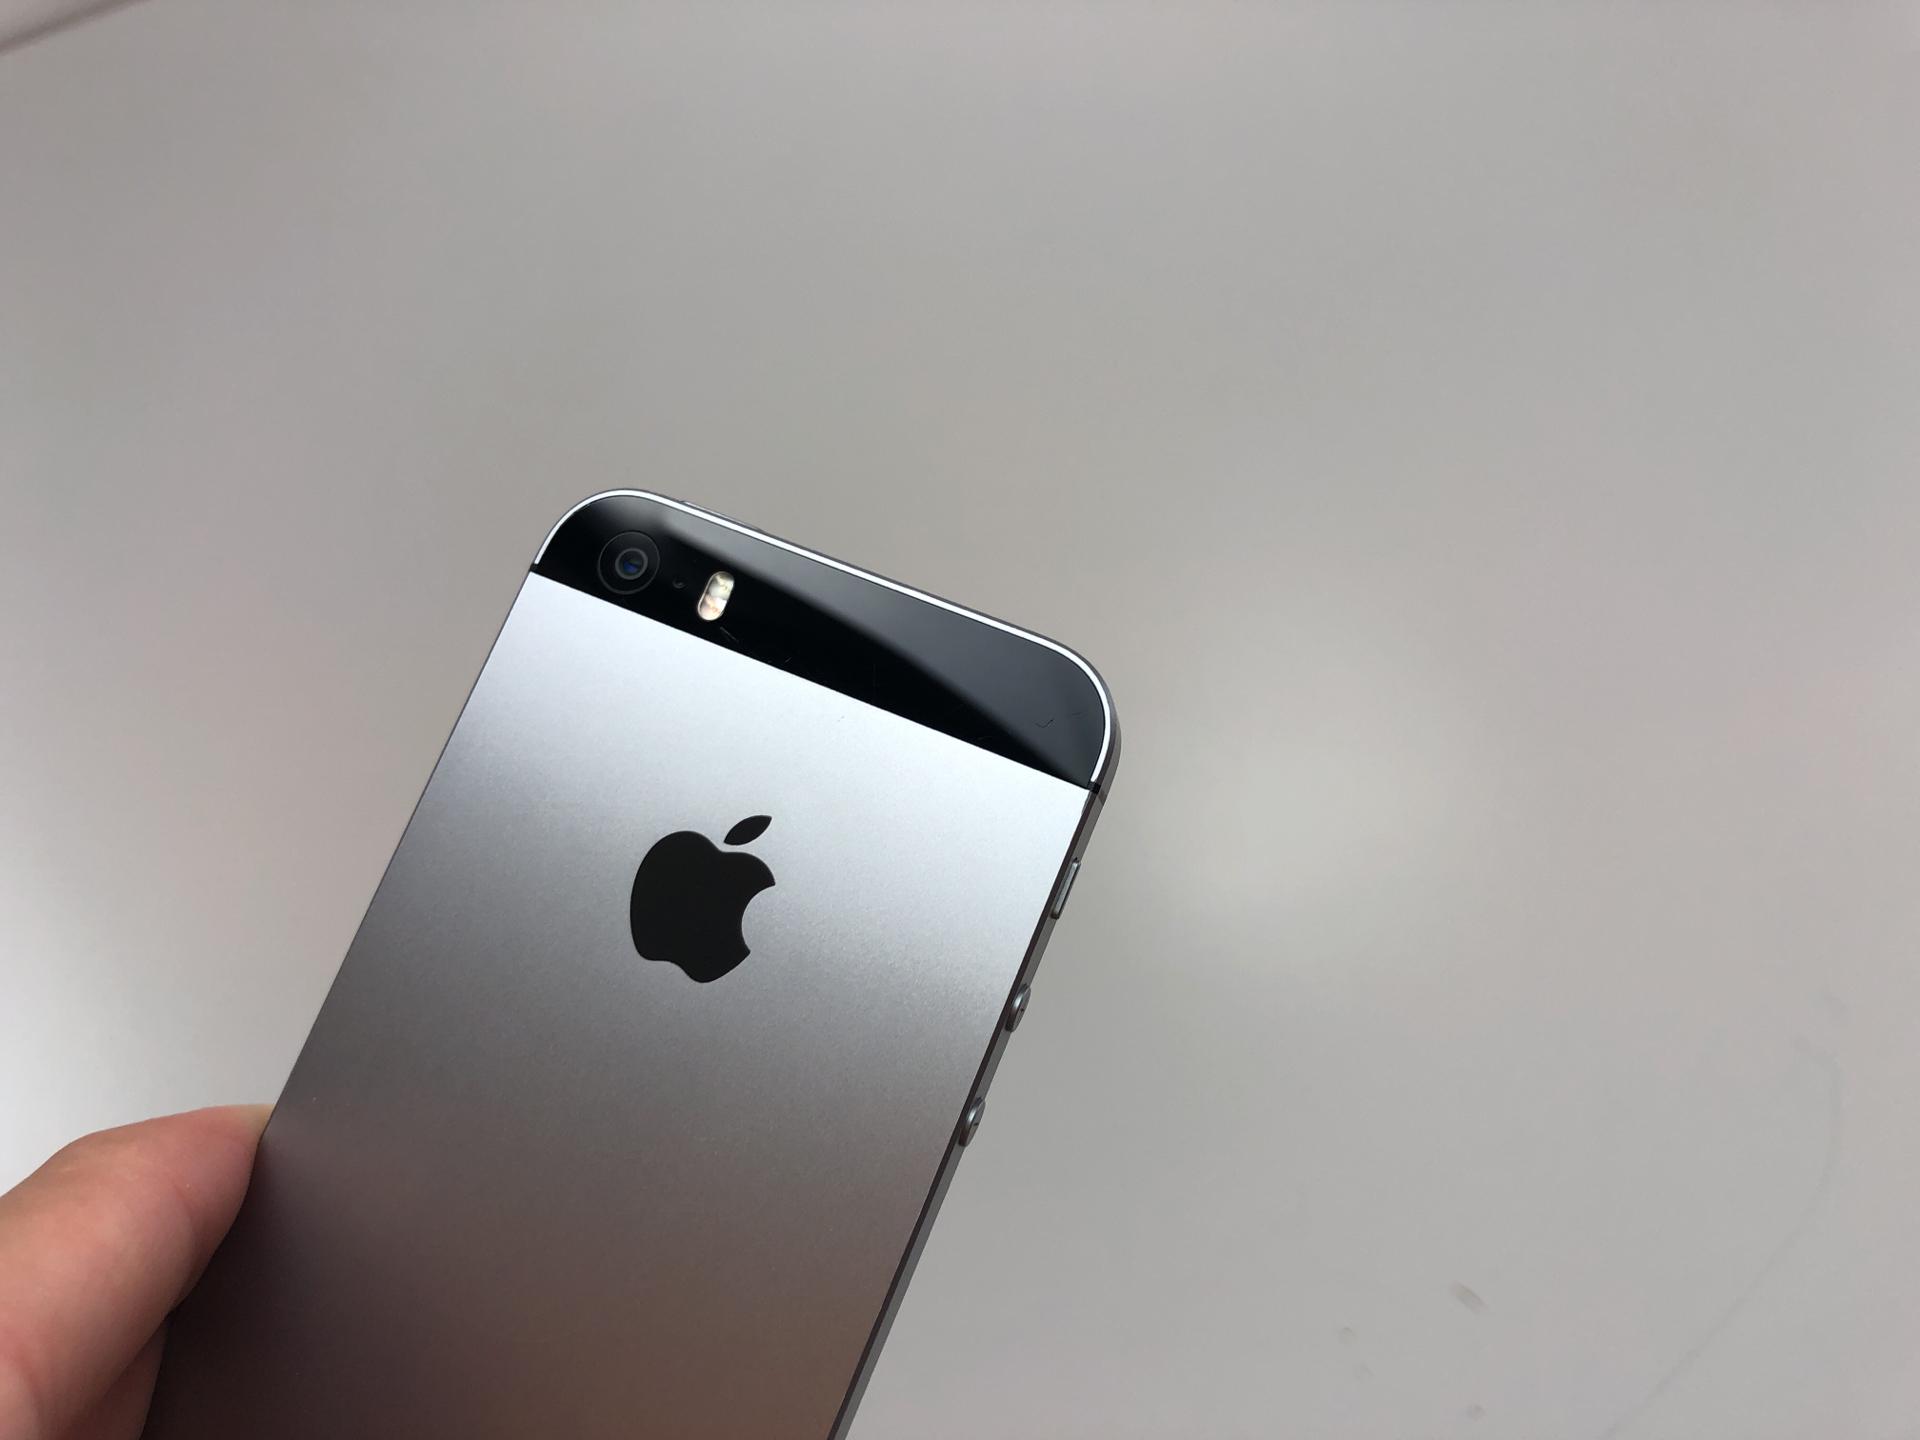 iPhone SE 32GB, 32GB, Space Gray, bild 6